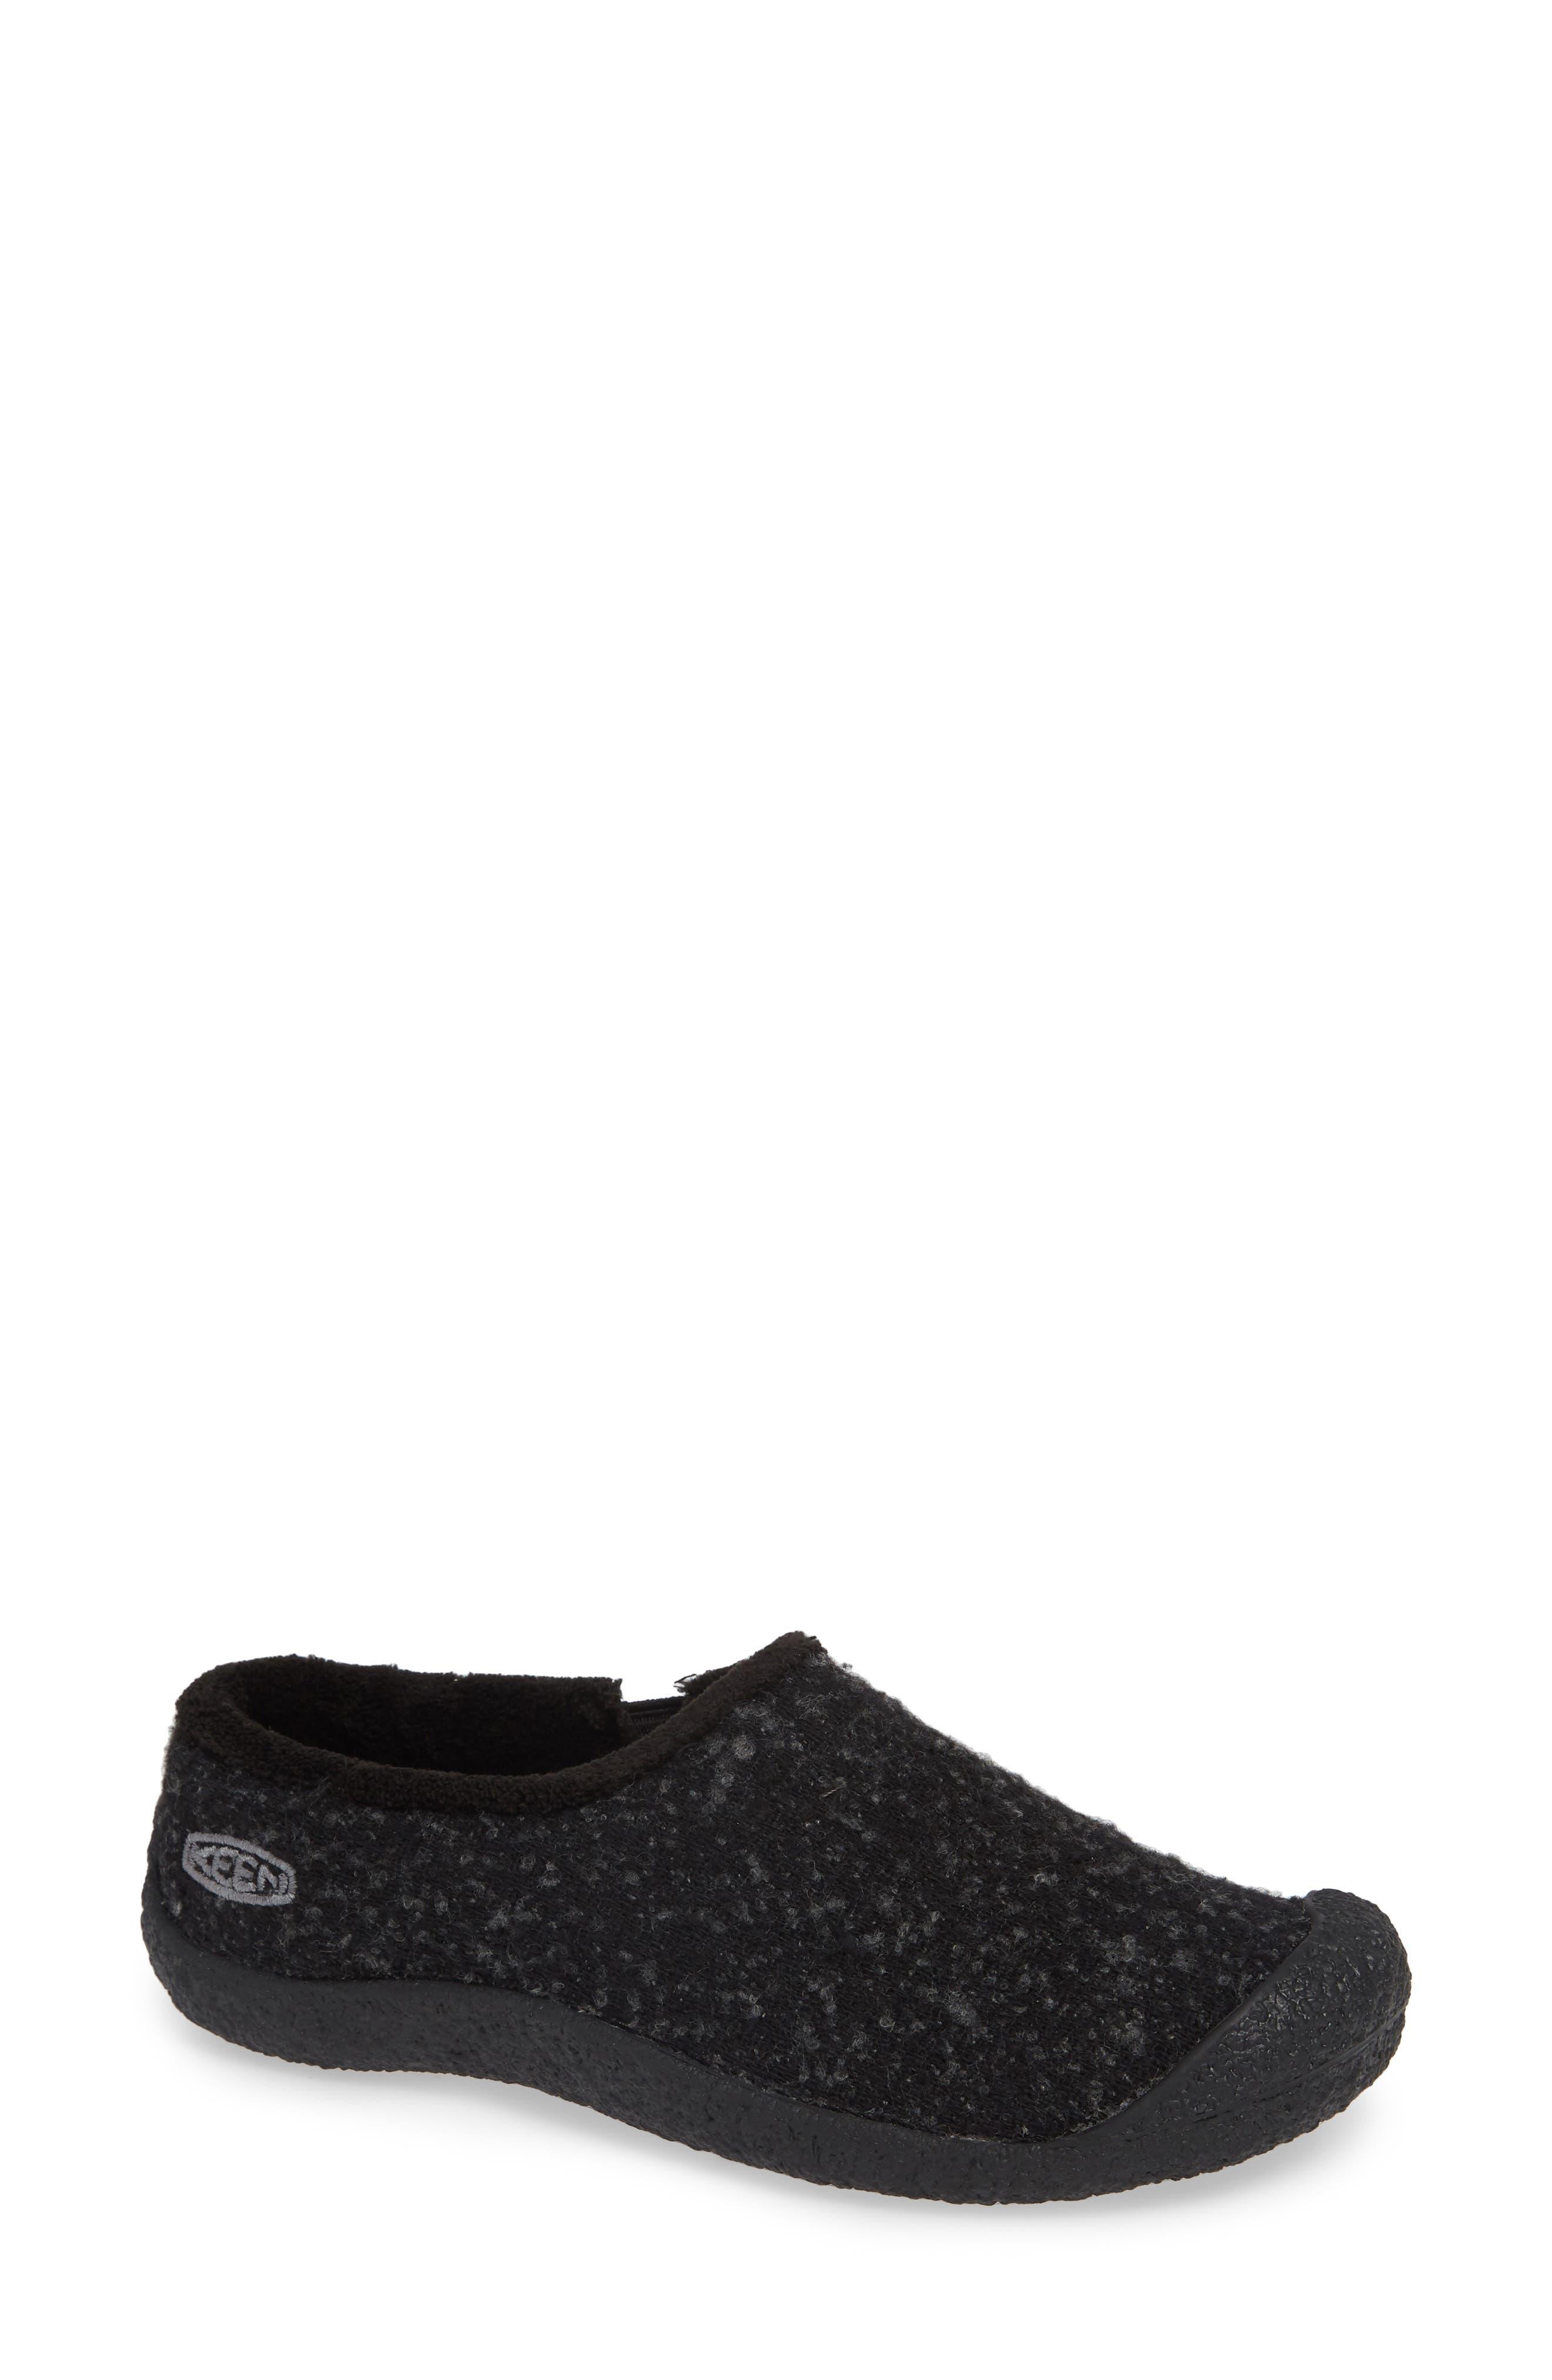 Howser Round Toe Wool Slip-on,                             Main thumbnail 1, color,                             BLACK KNOBBY/ STEEL GREY WOOL